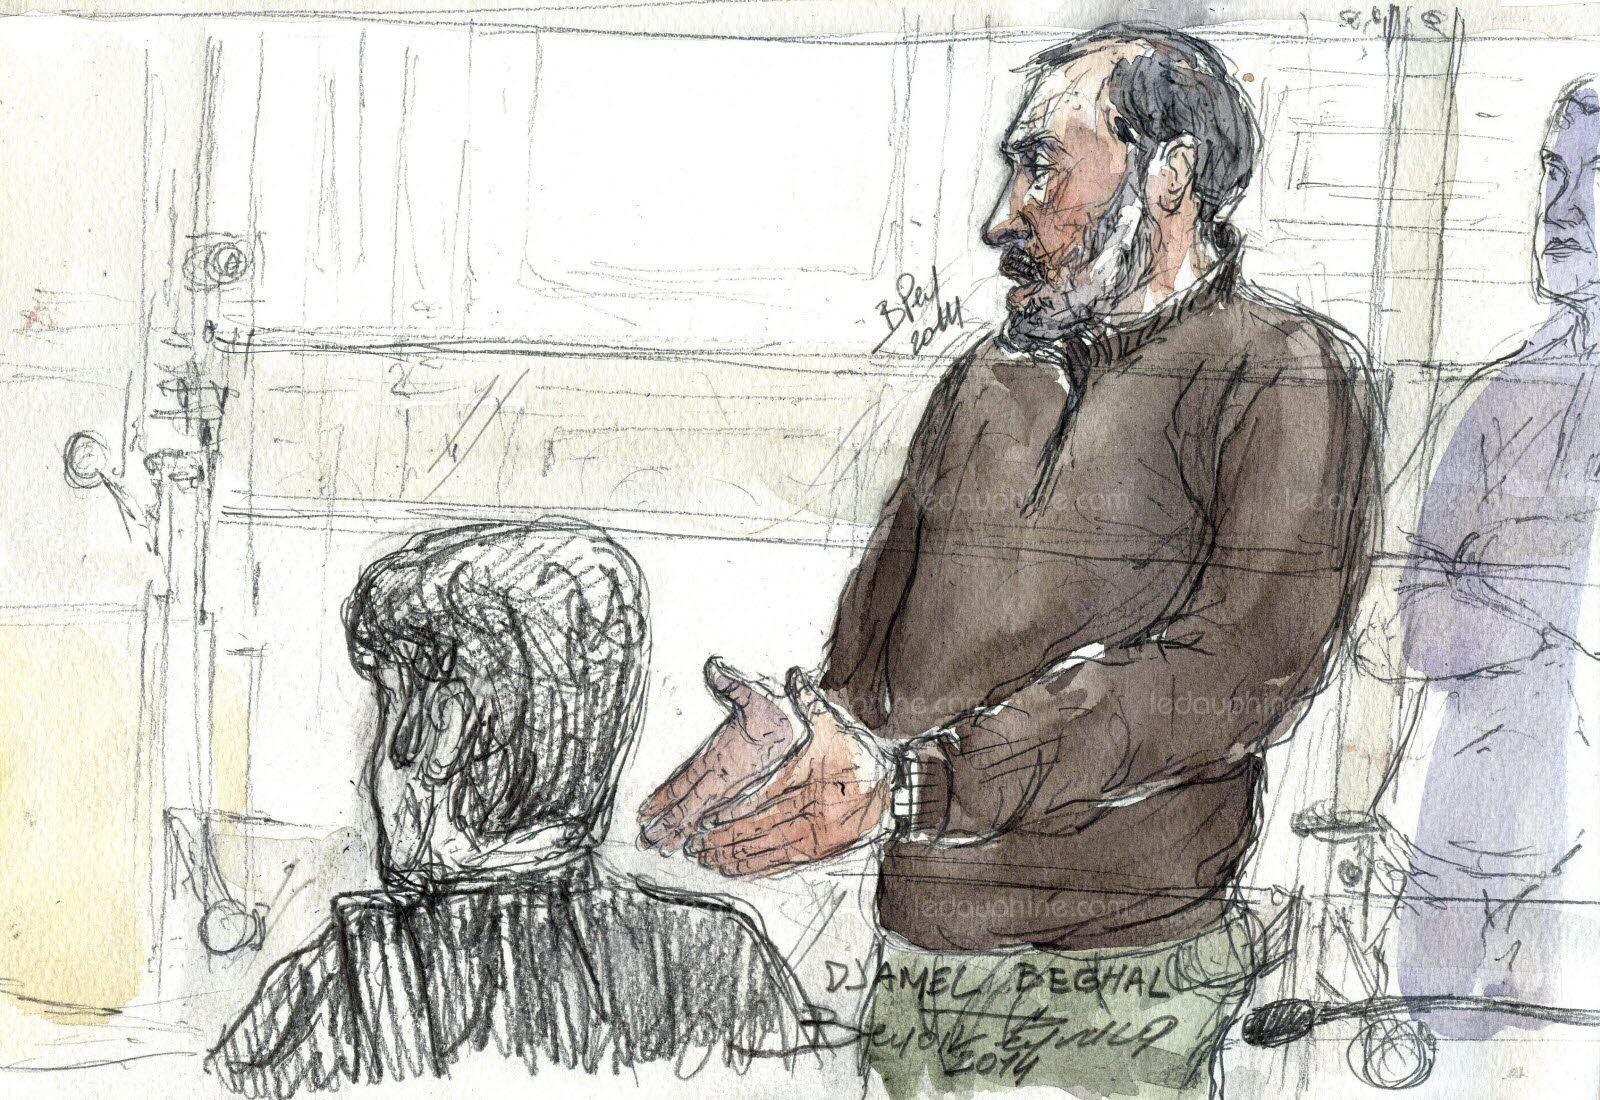 Terrorisme: Djamel Beghal remis aux autorités